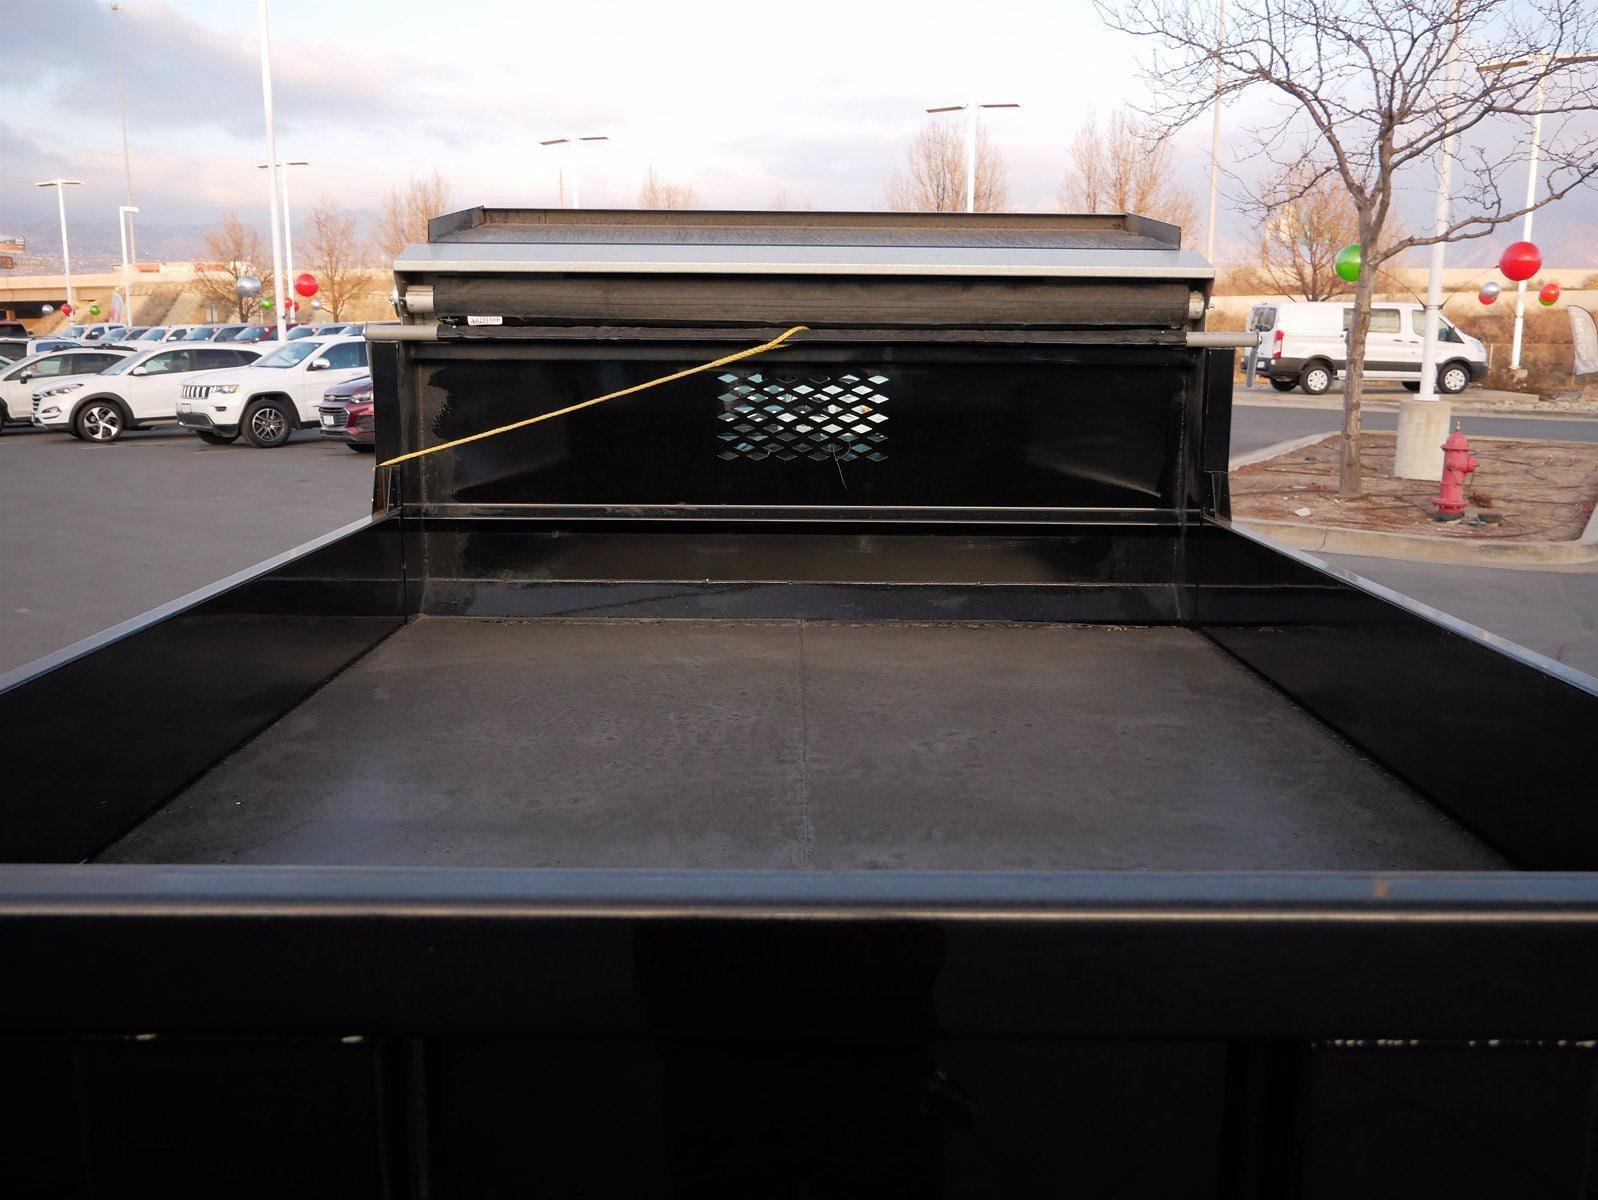 2021 Ford F-550 Regular Cab DRW 4x4, Scelzi Dump Body #64096 - photo 20